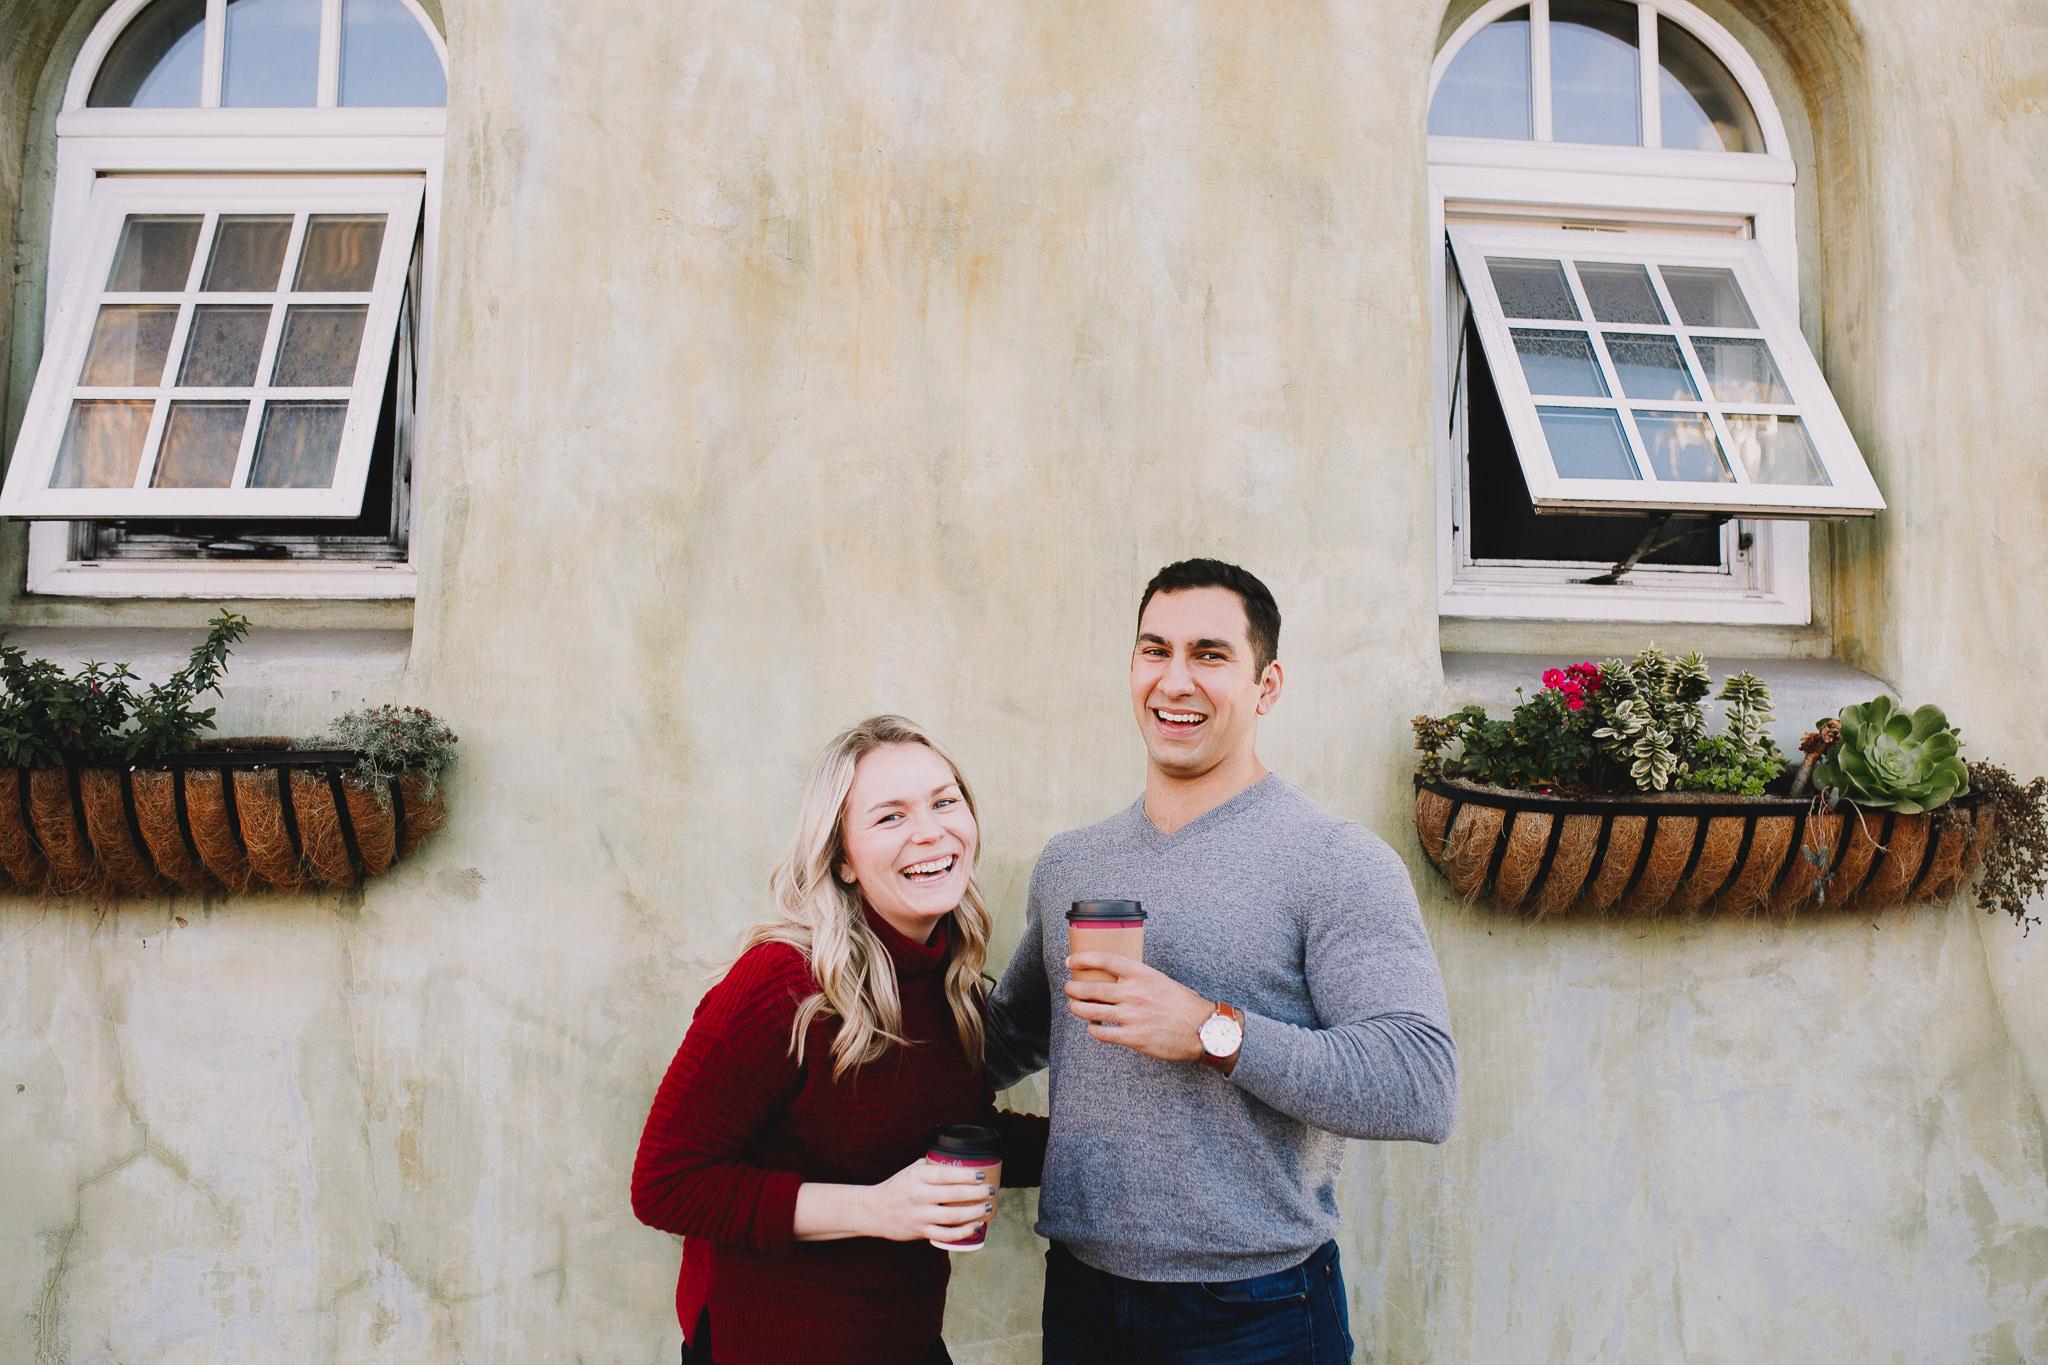 Archer Inspired Photography Capitola Beach Santa Cruz Wedding Engagement Lifestyle Session Photographer-7.jpg